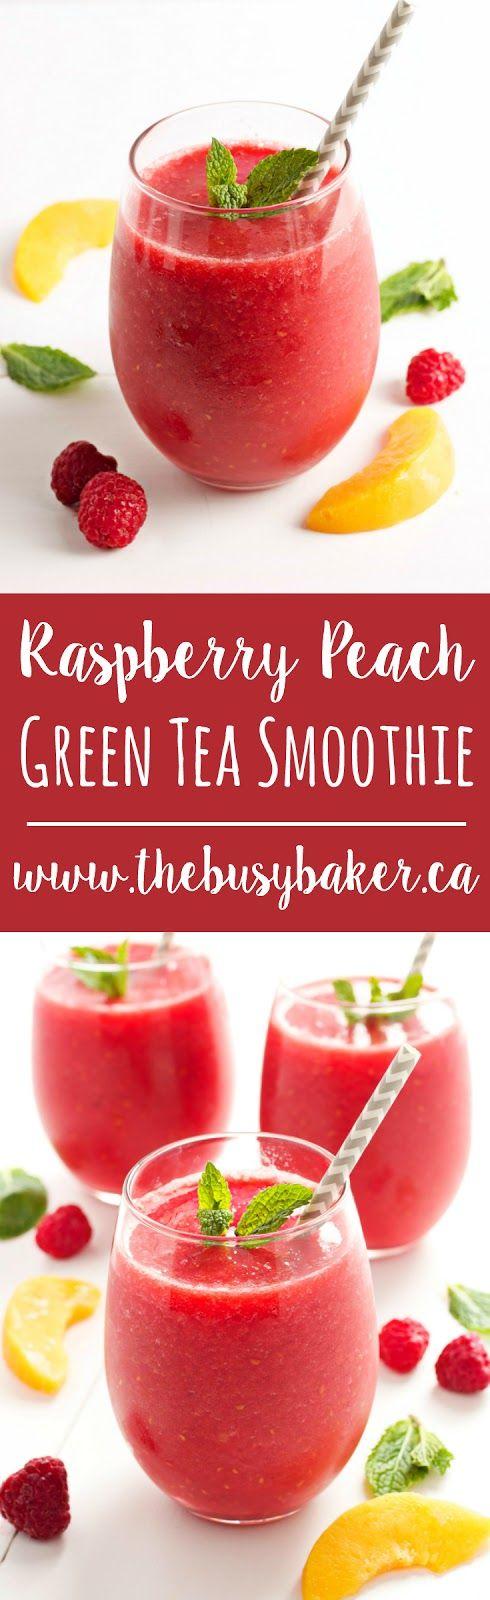 Raspberry Peach Green Tea Smoothie www.thebusybaker.ca